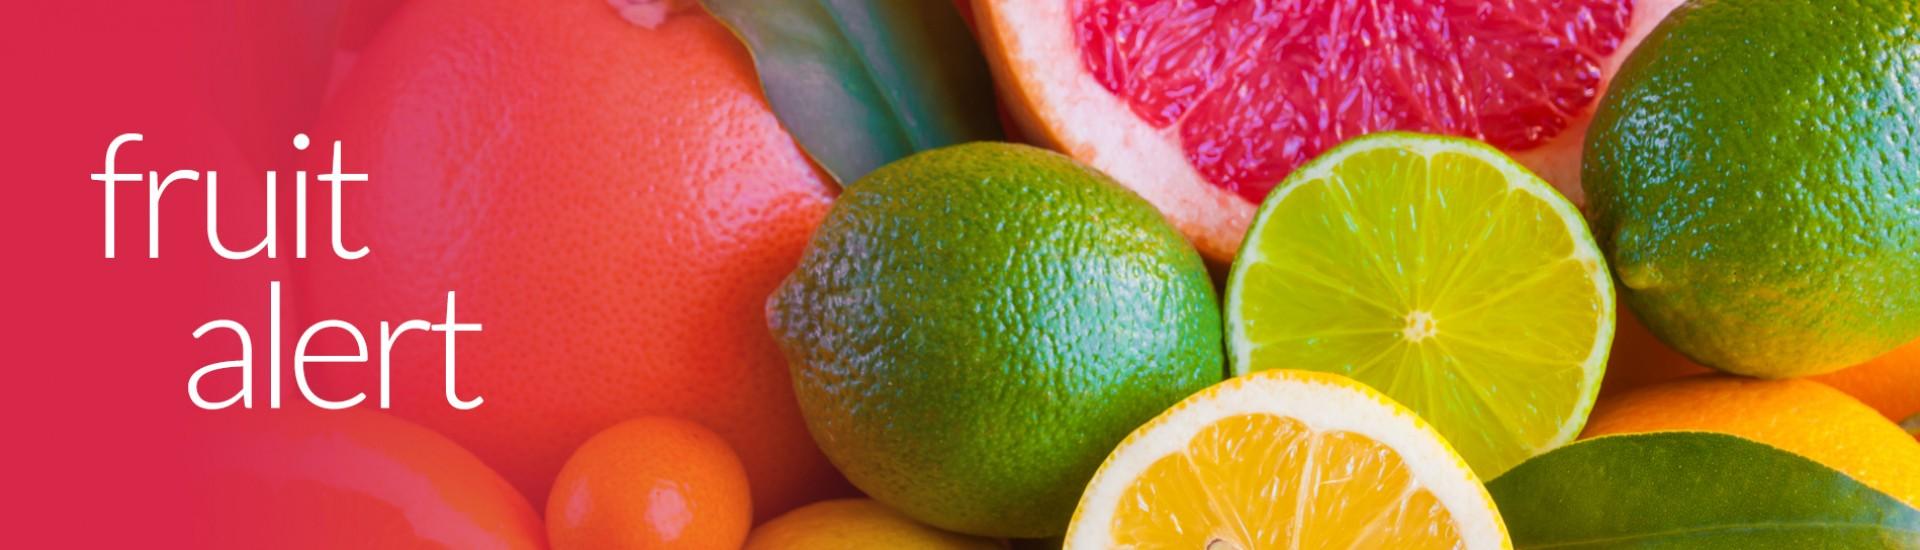 Fruital